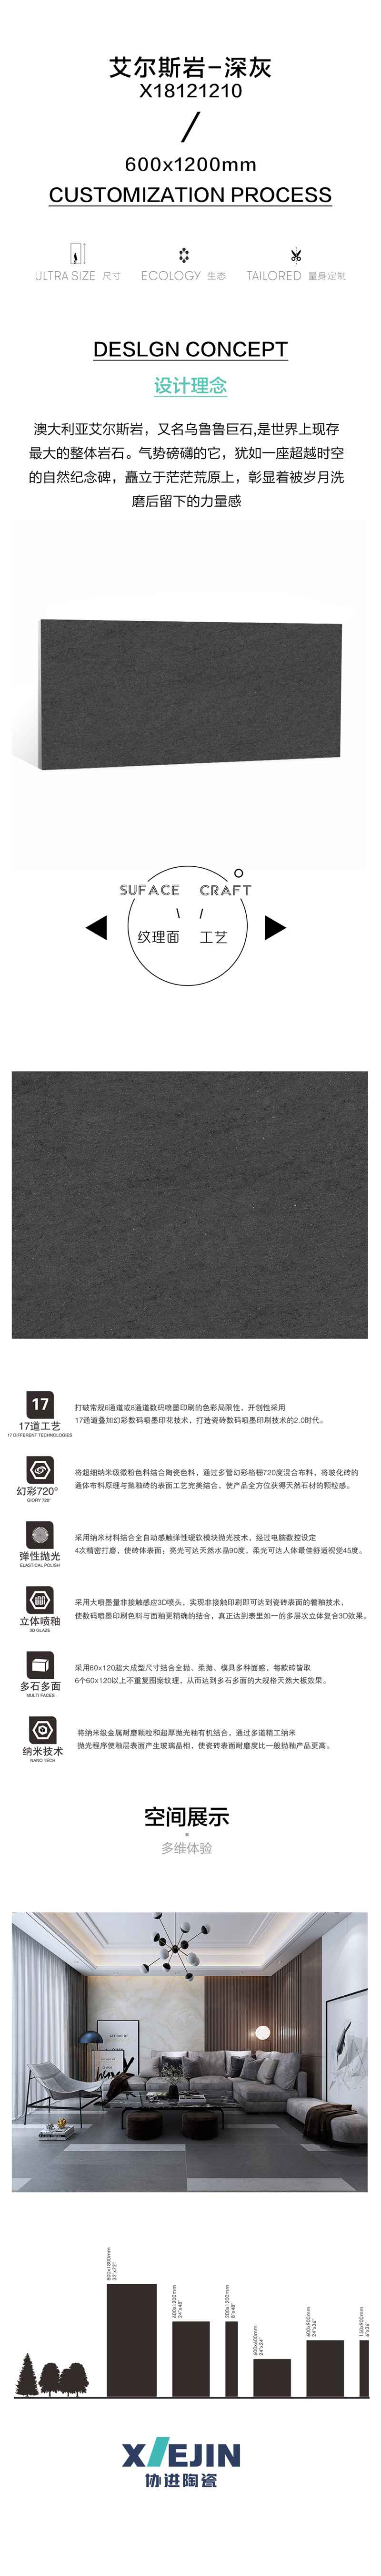 X18121210--17.jpg